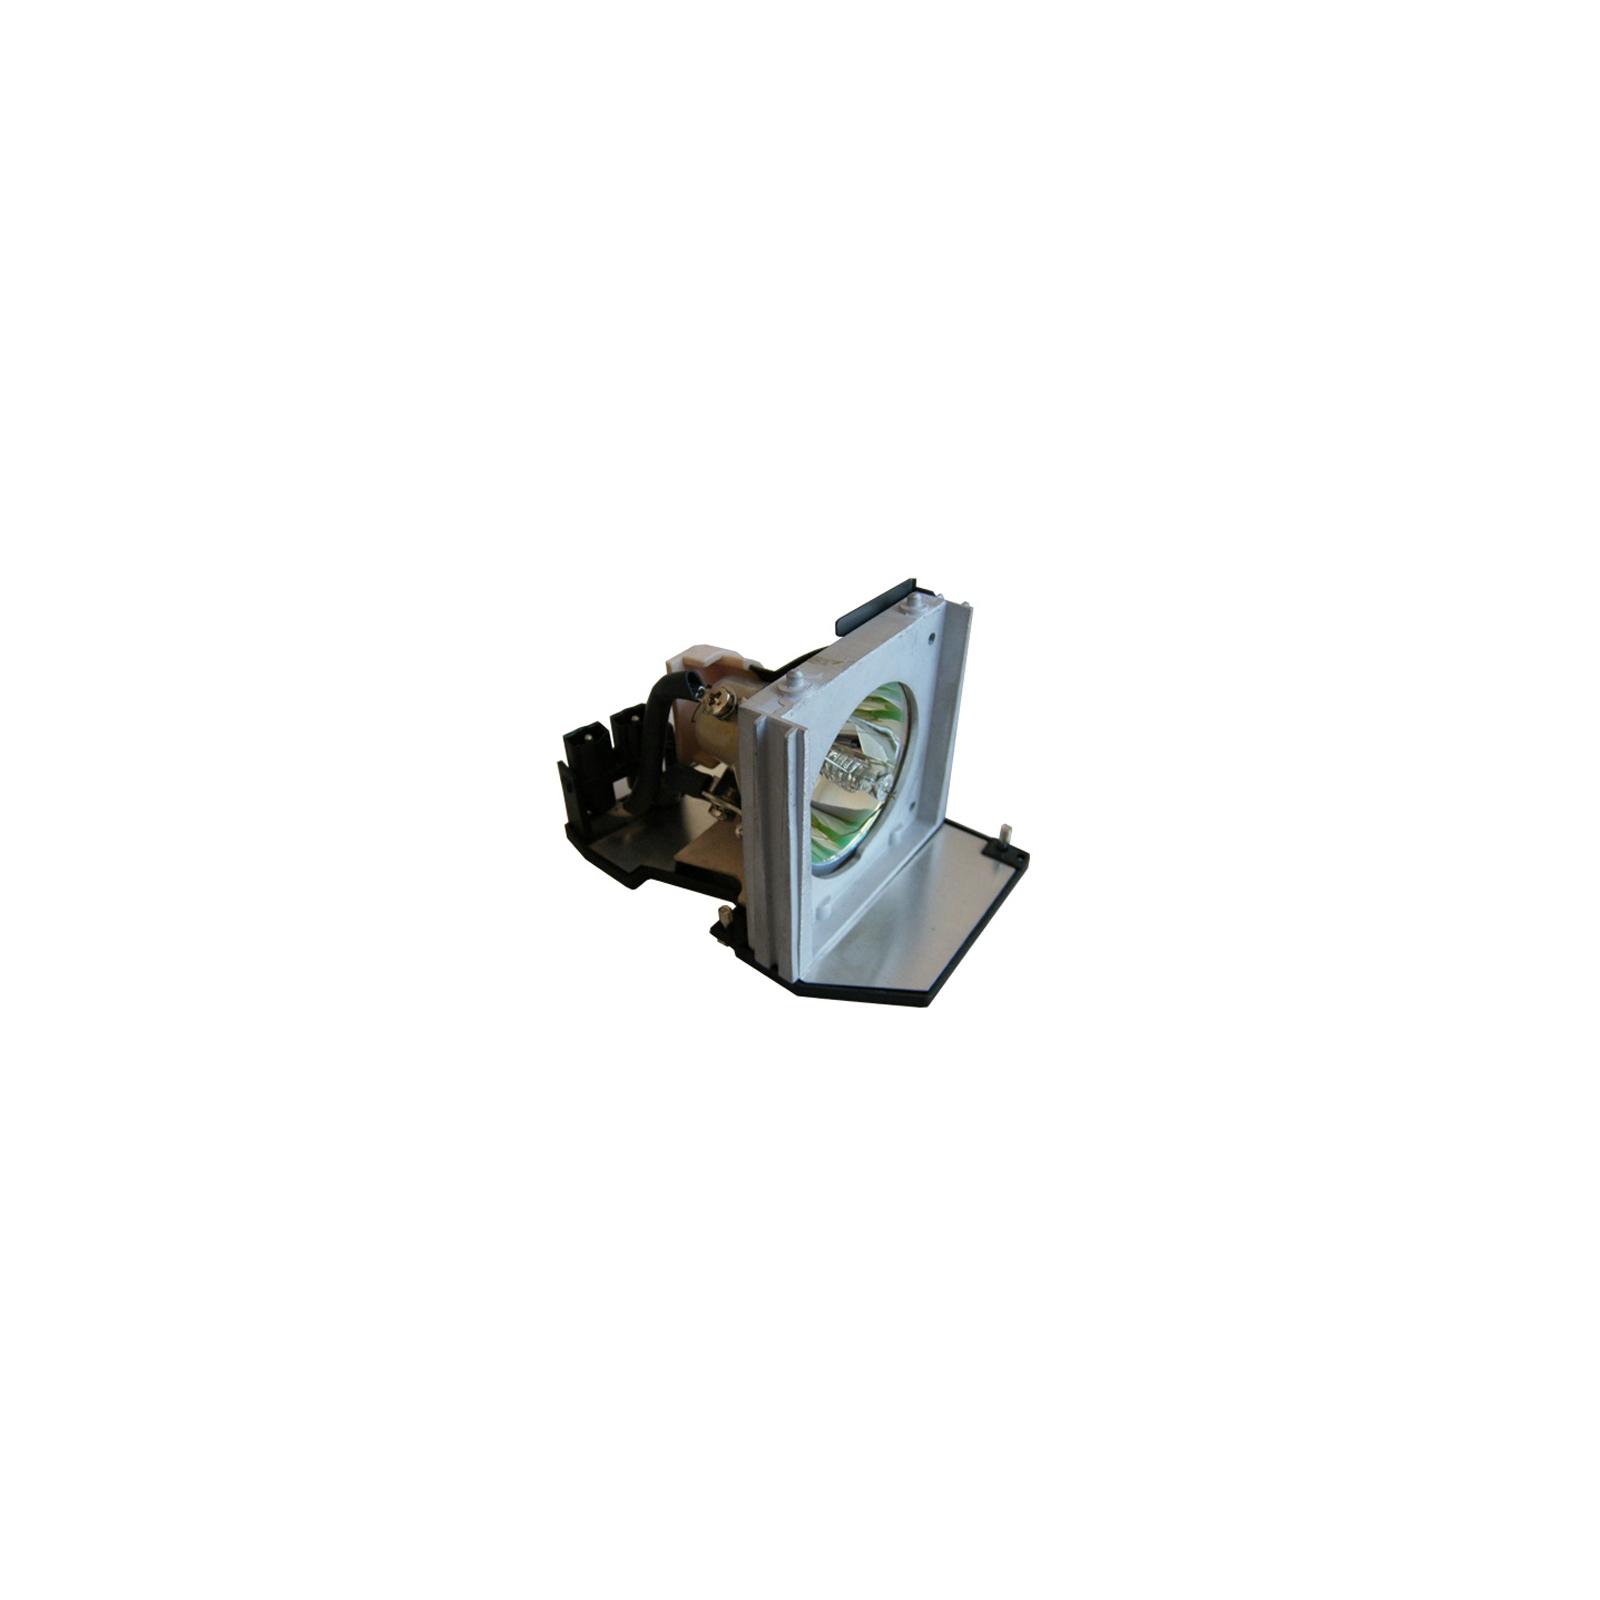 Лампа проектора Acer X1161P/X1261P/X110P (EC.JBU00.001)